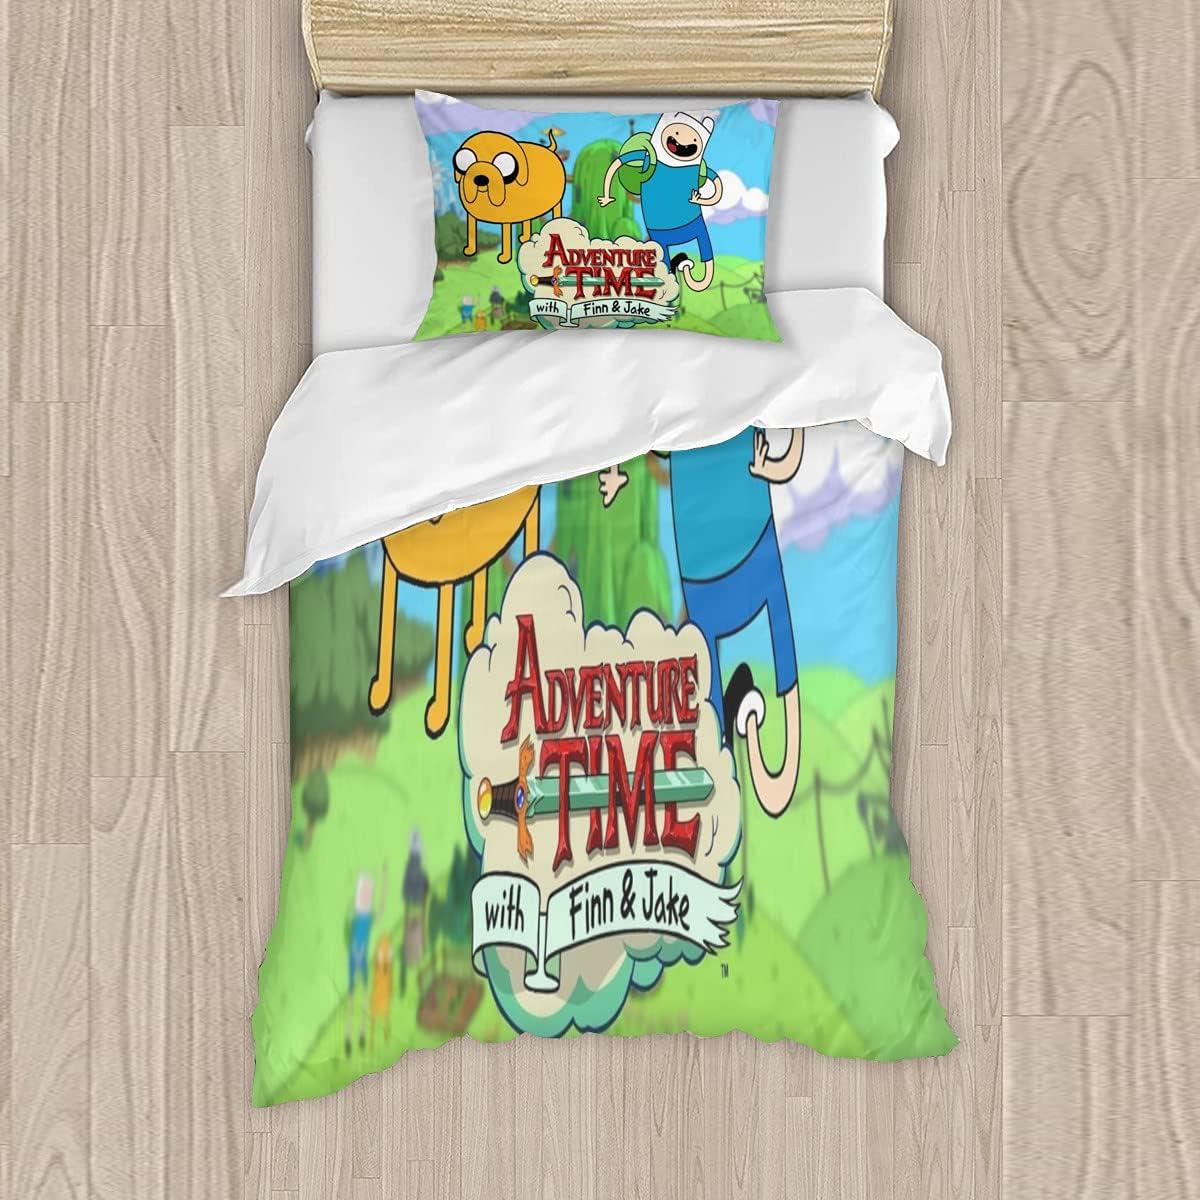 Adventure Time Free Shipping New Unisex 3-Piece Bedding Su Zipper ...